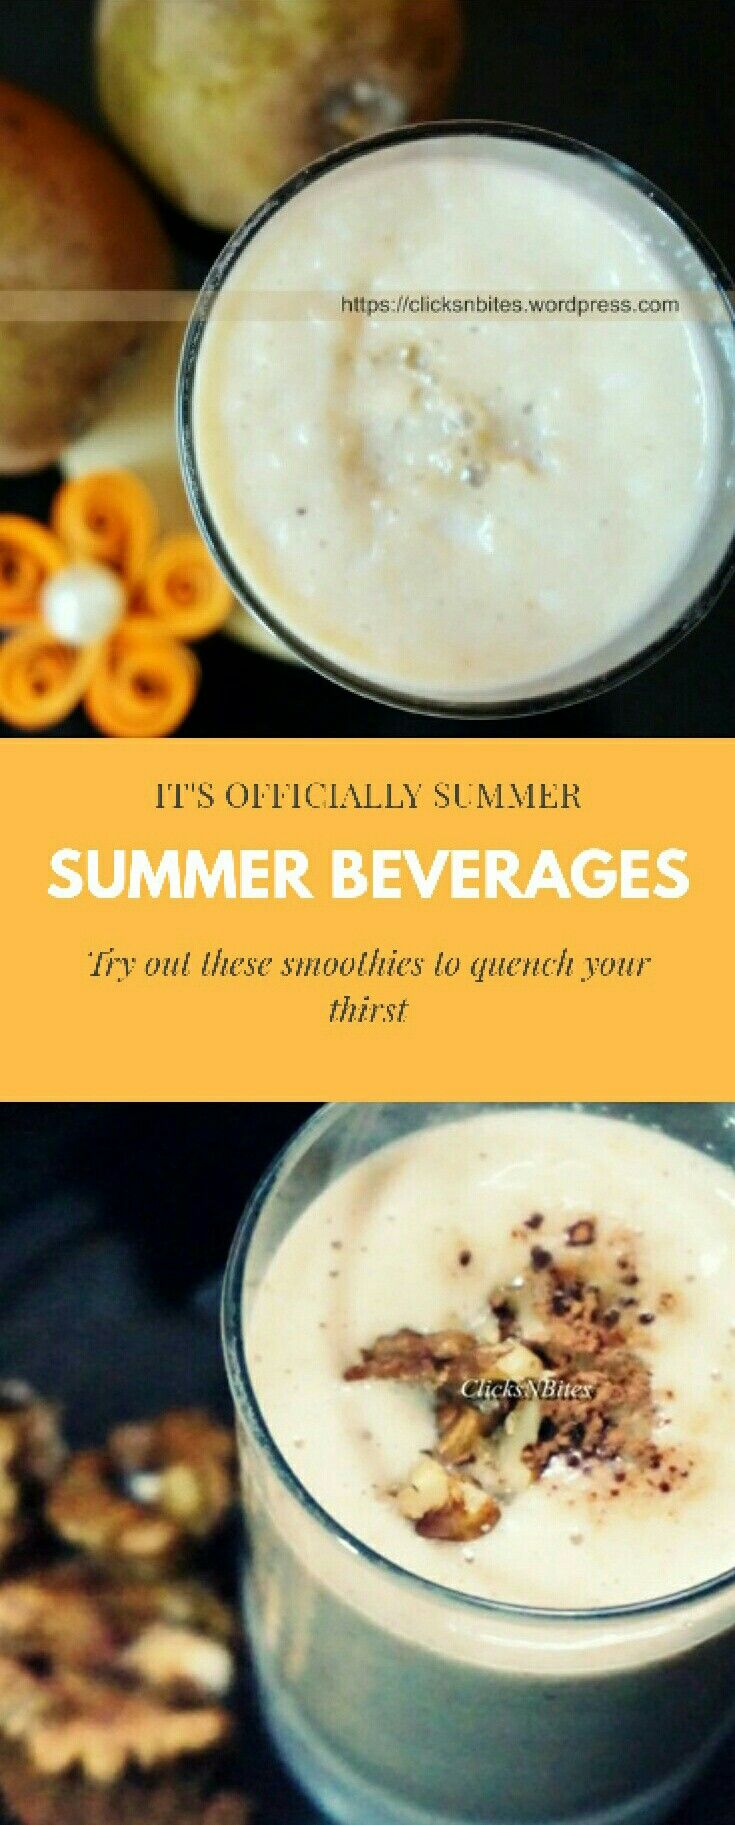 Beverages Clicks N Bites Veggie Smoothie Recipes Nutritious Breakfast Smoothies Fruit Vegetable Smoothie